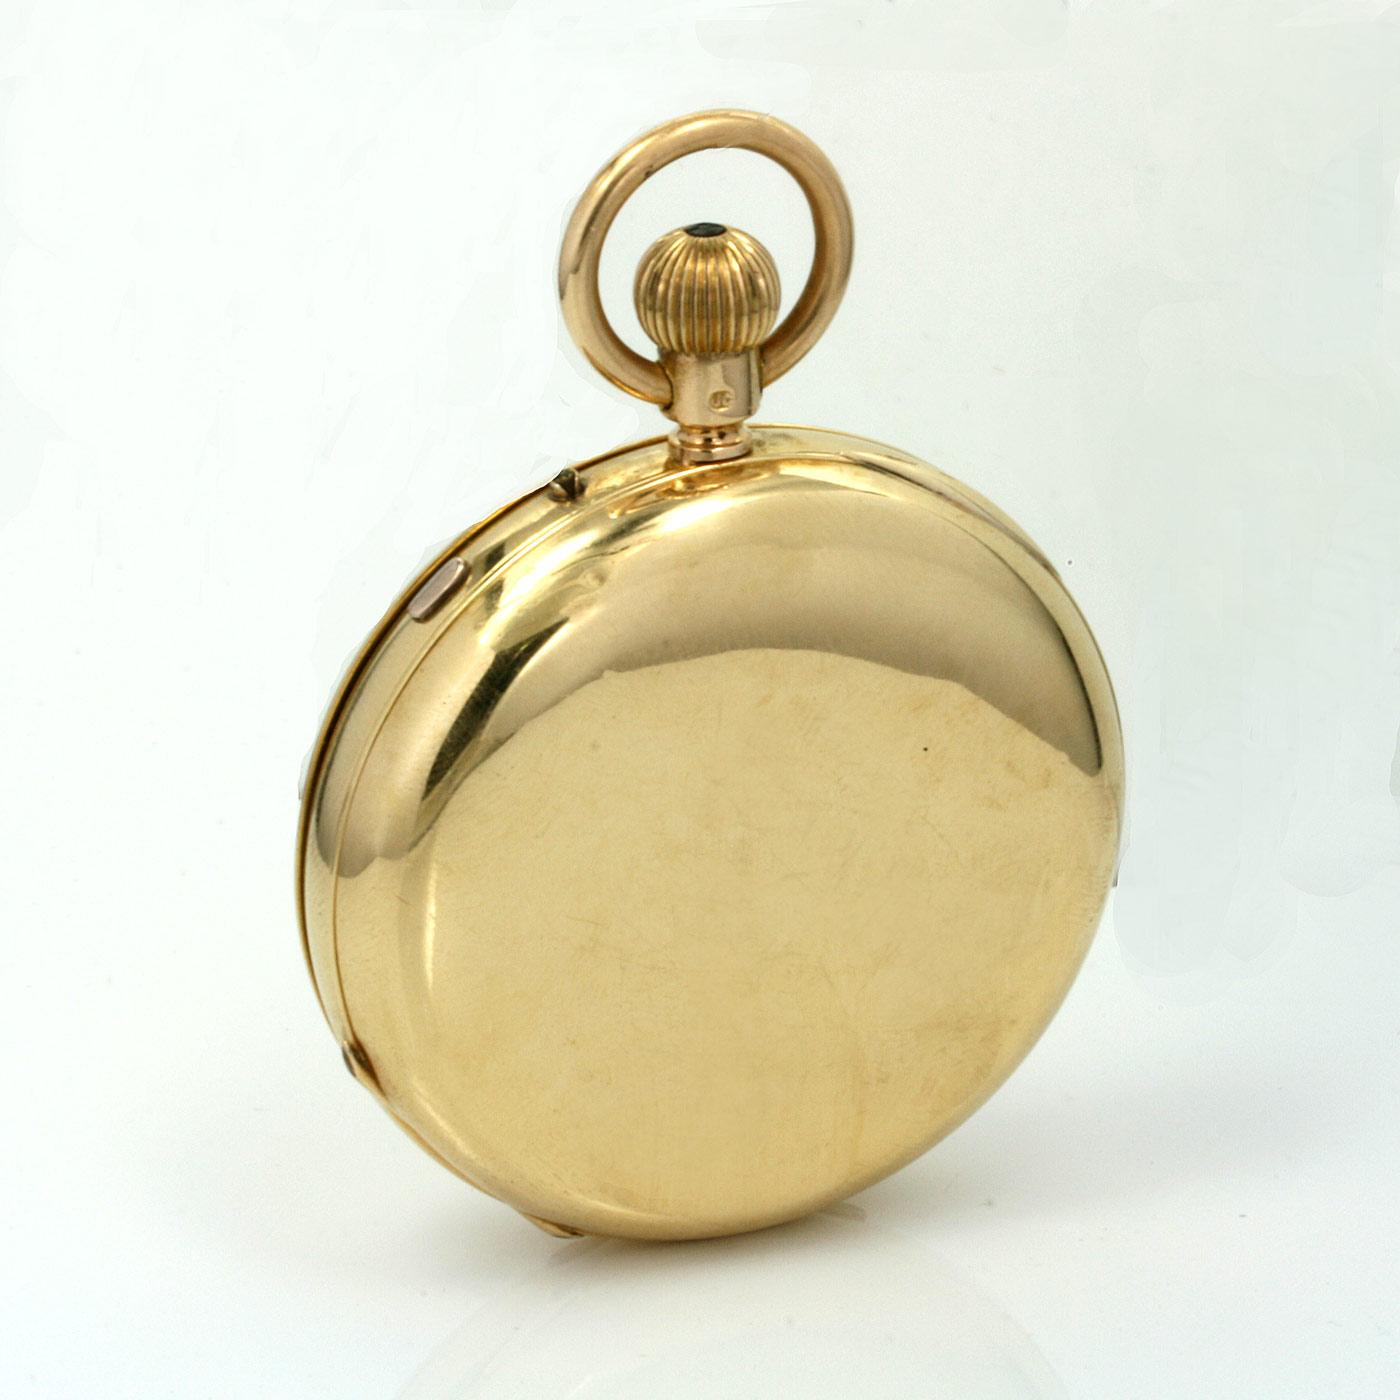 J. Hargreaves & Co. Liverpool pocket watch 18 karat gold ...